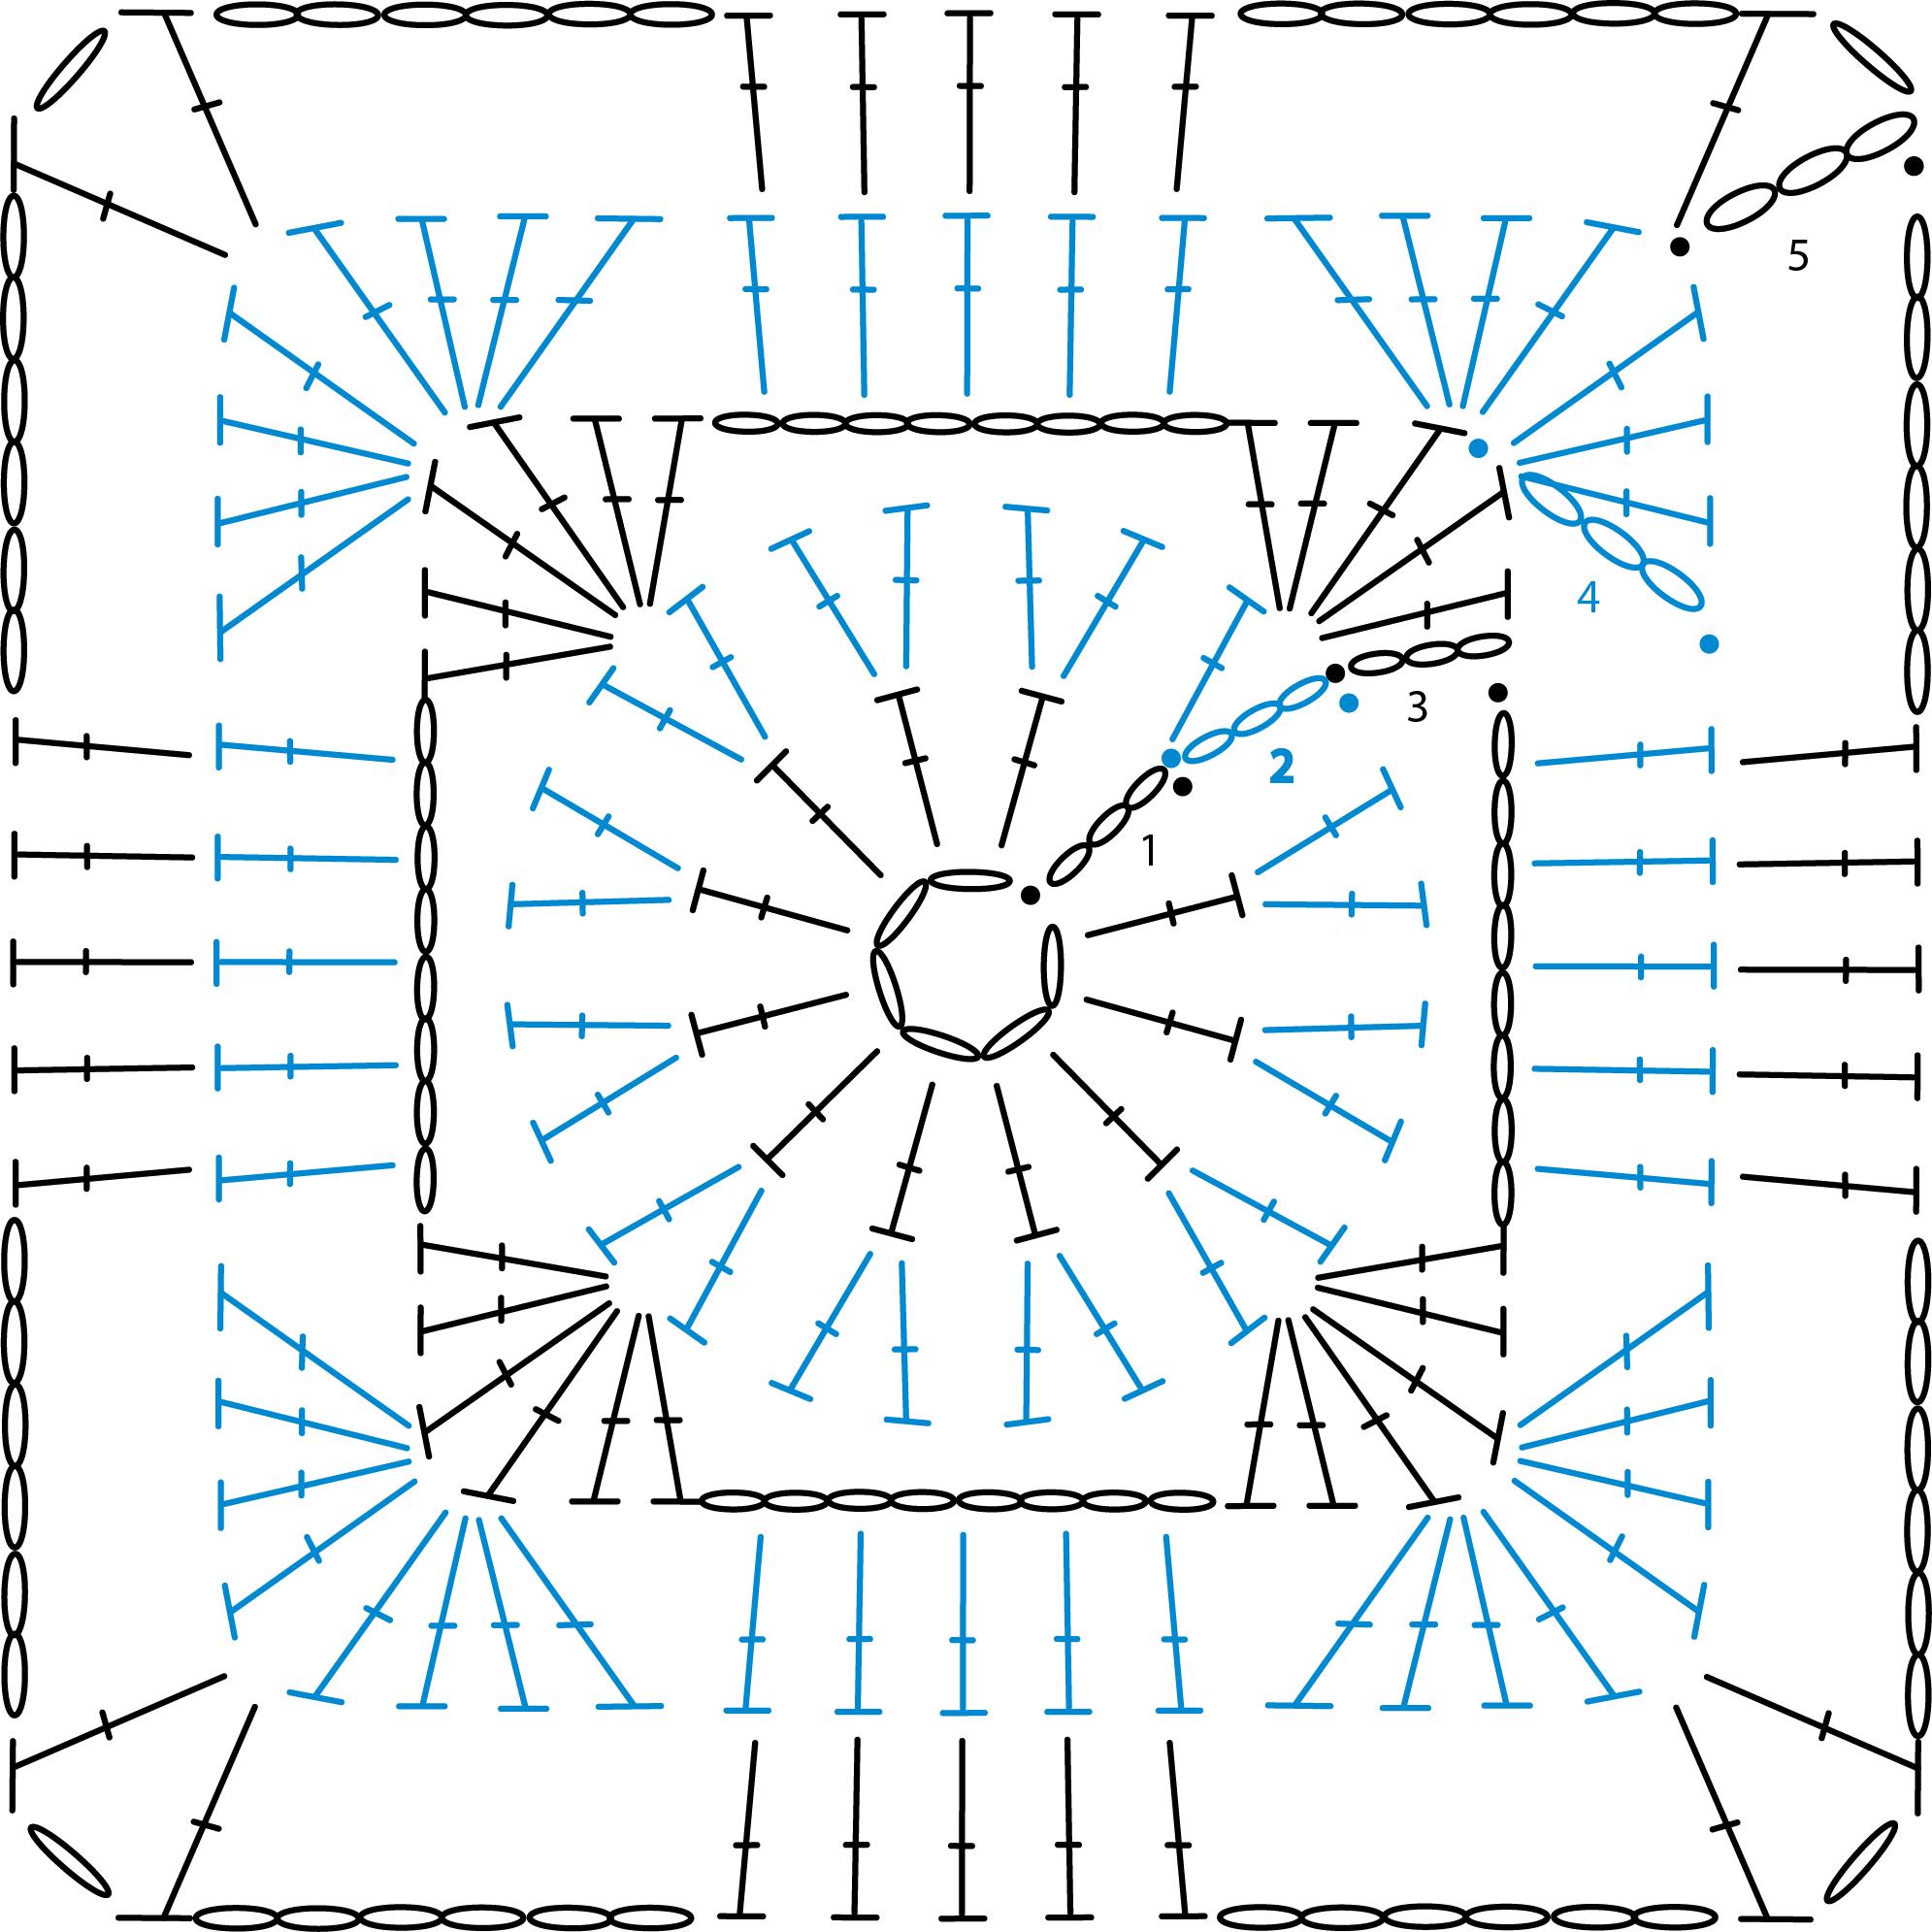 Granny square crculo en un cuadrado pinteres lots of granny square patterns with diagrams bankloansurffo Images